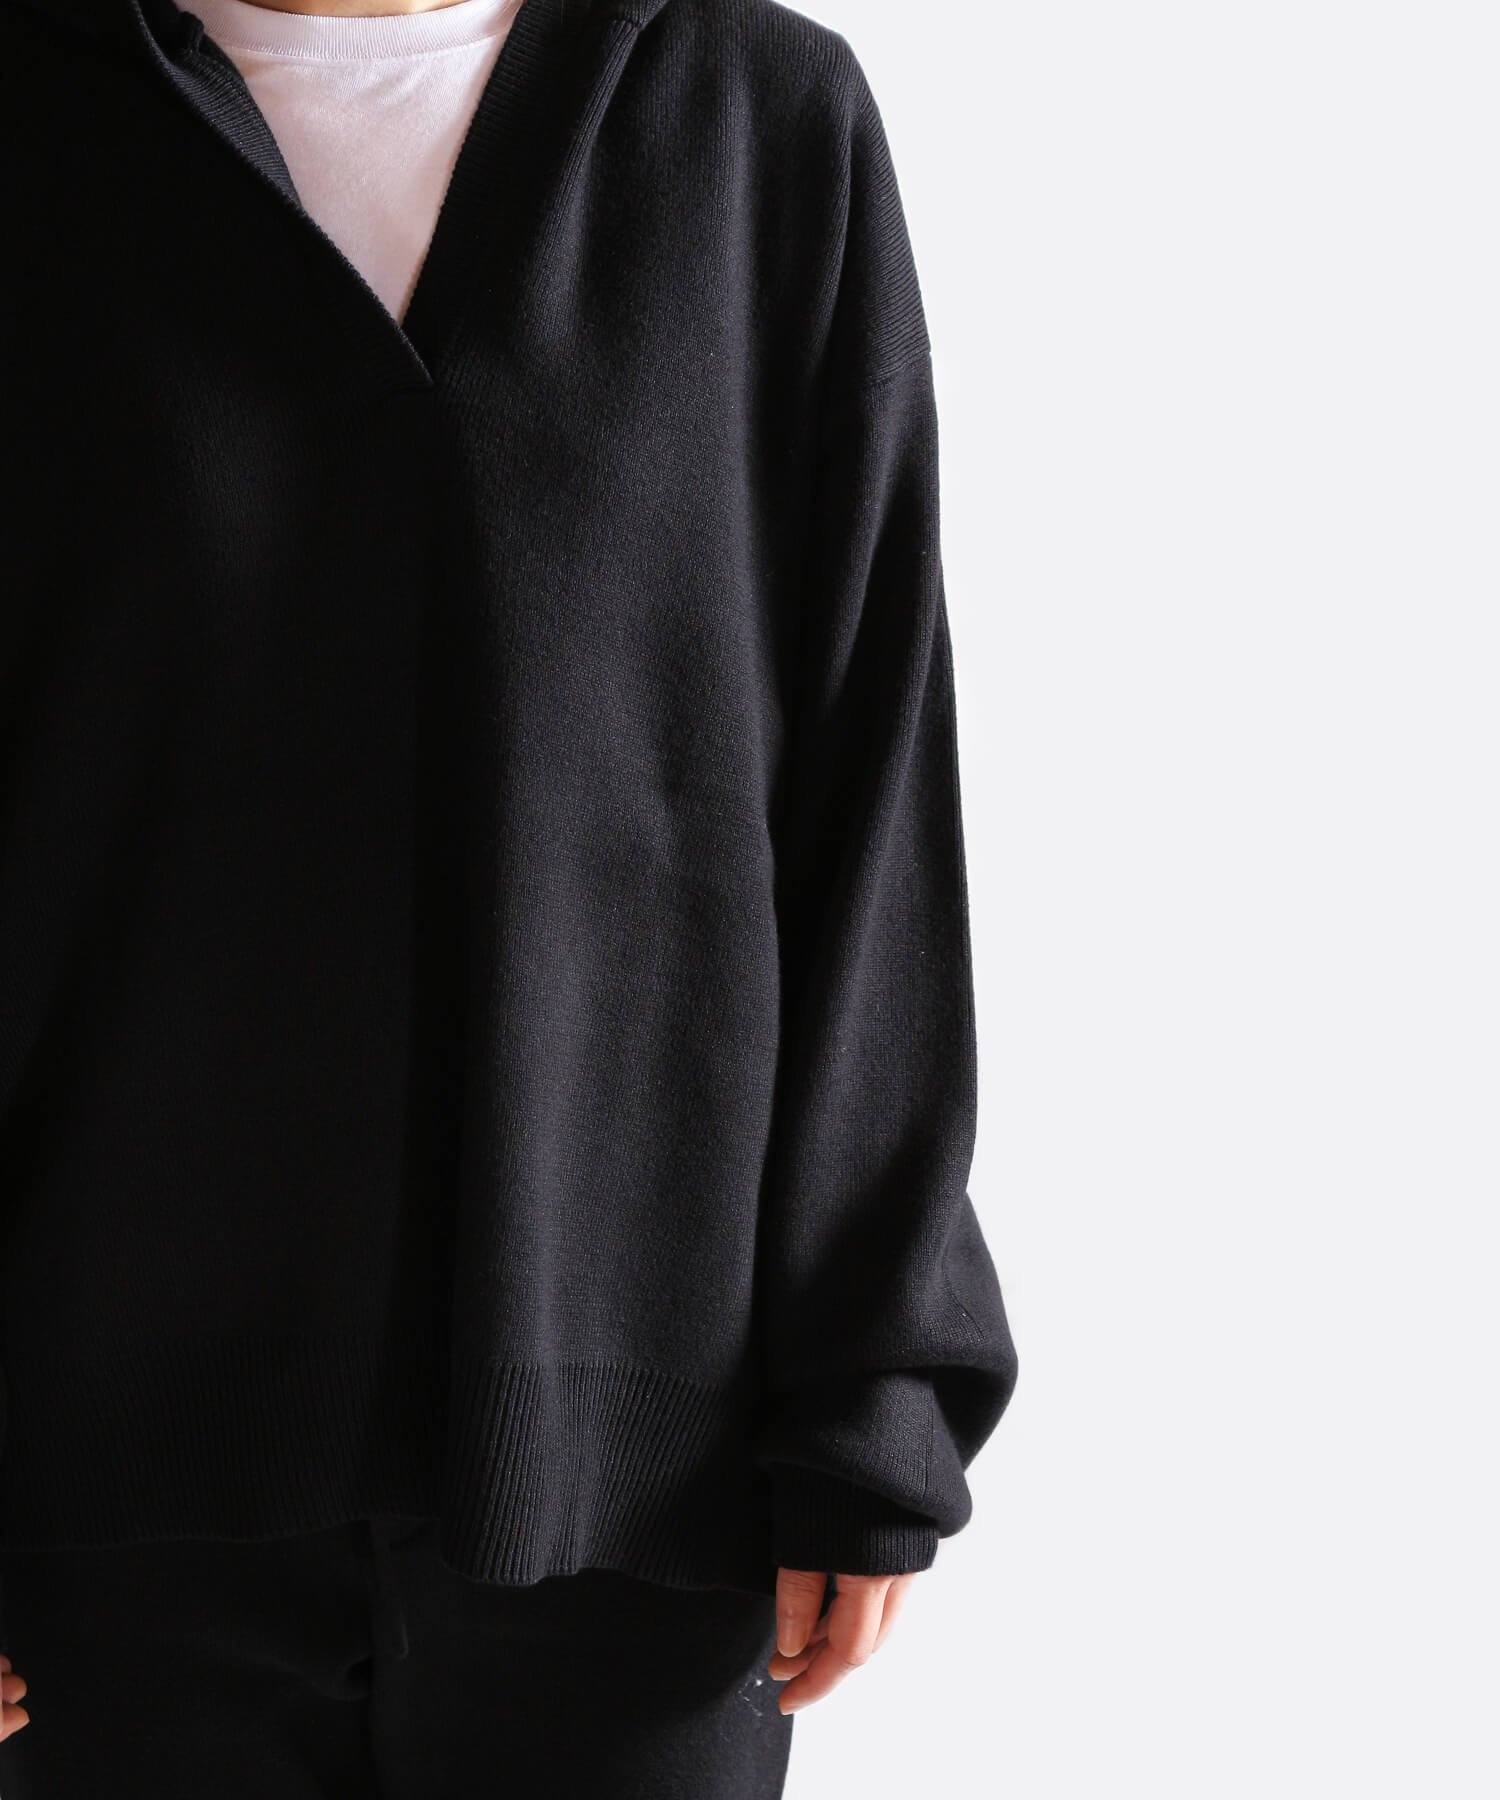 NIL DUE / NIL UN TOKYO / ニル デュエ / ニル アン トーキョー | RIB KNIT LOUNGE SET (BLACK) 商品画像25